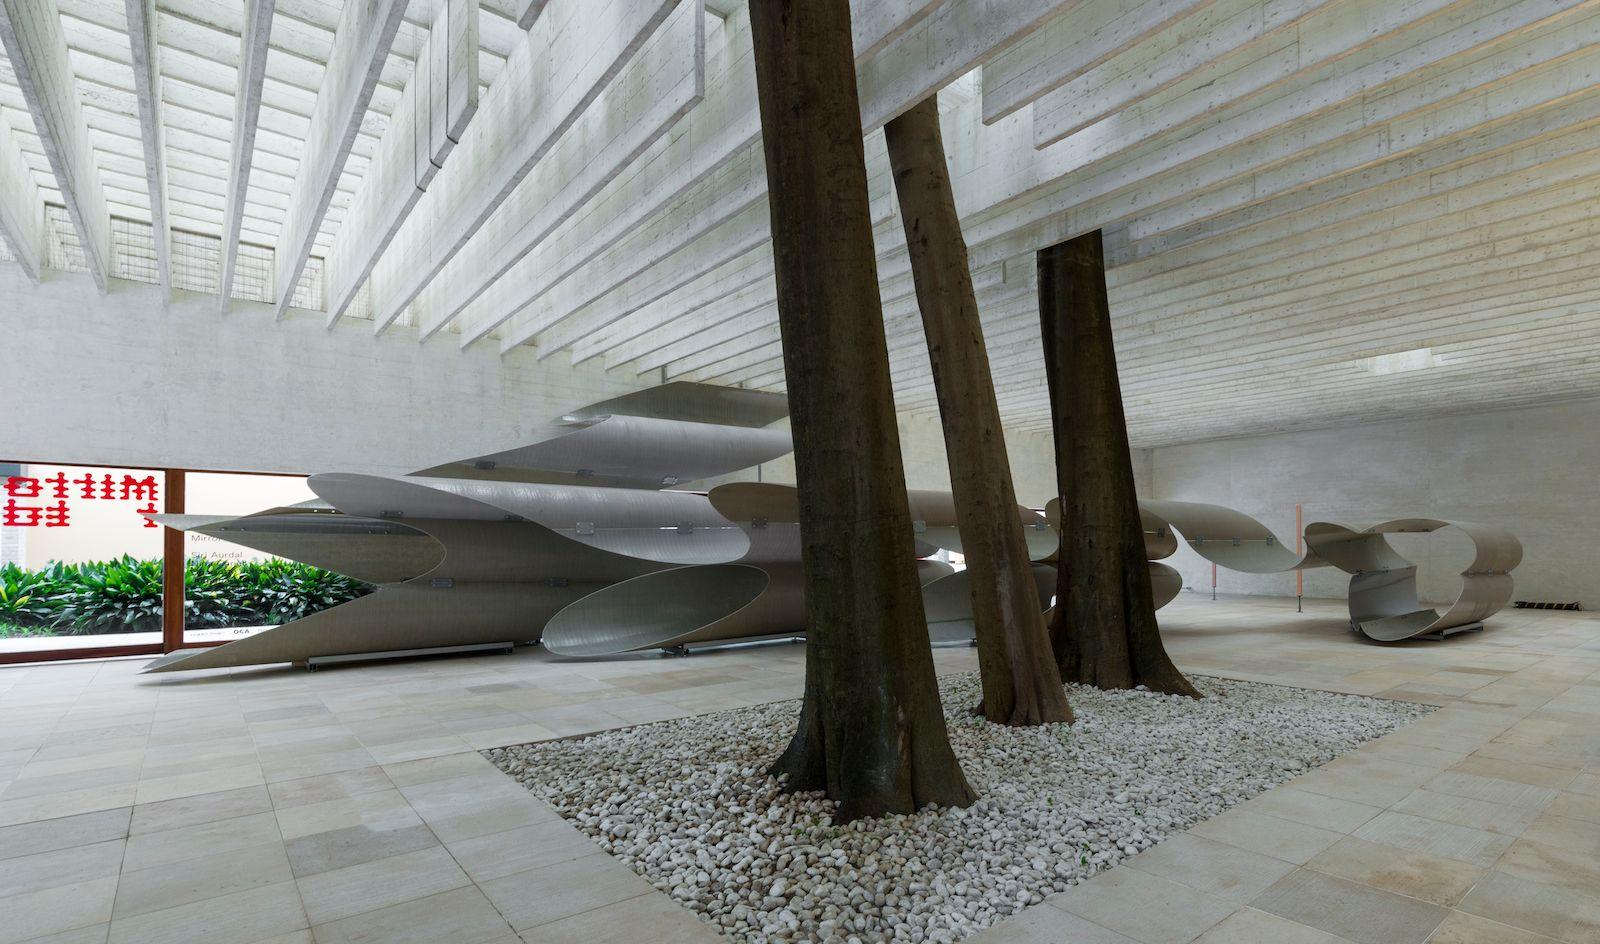 Onda Volante (Flying Wave), 2017,  fiberglass reinforced polyester, metal fittings, Nordic Pavilion Venice 2017, image courtesy of Moderna Museet, Photo: Åsa Lundén